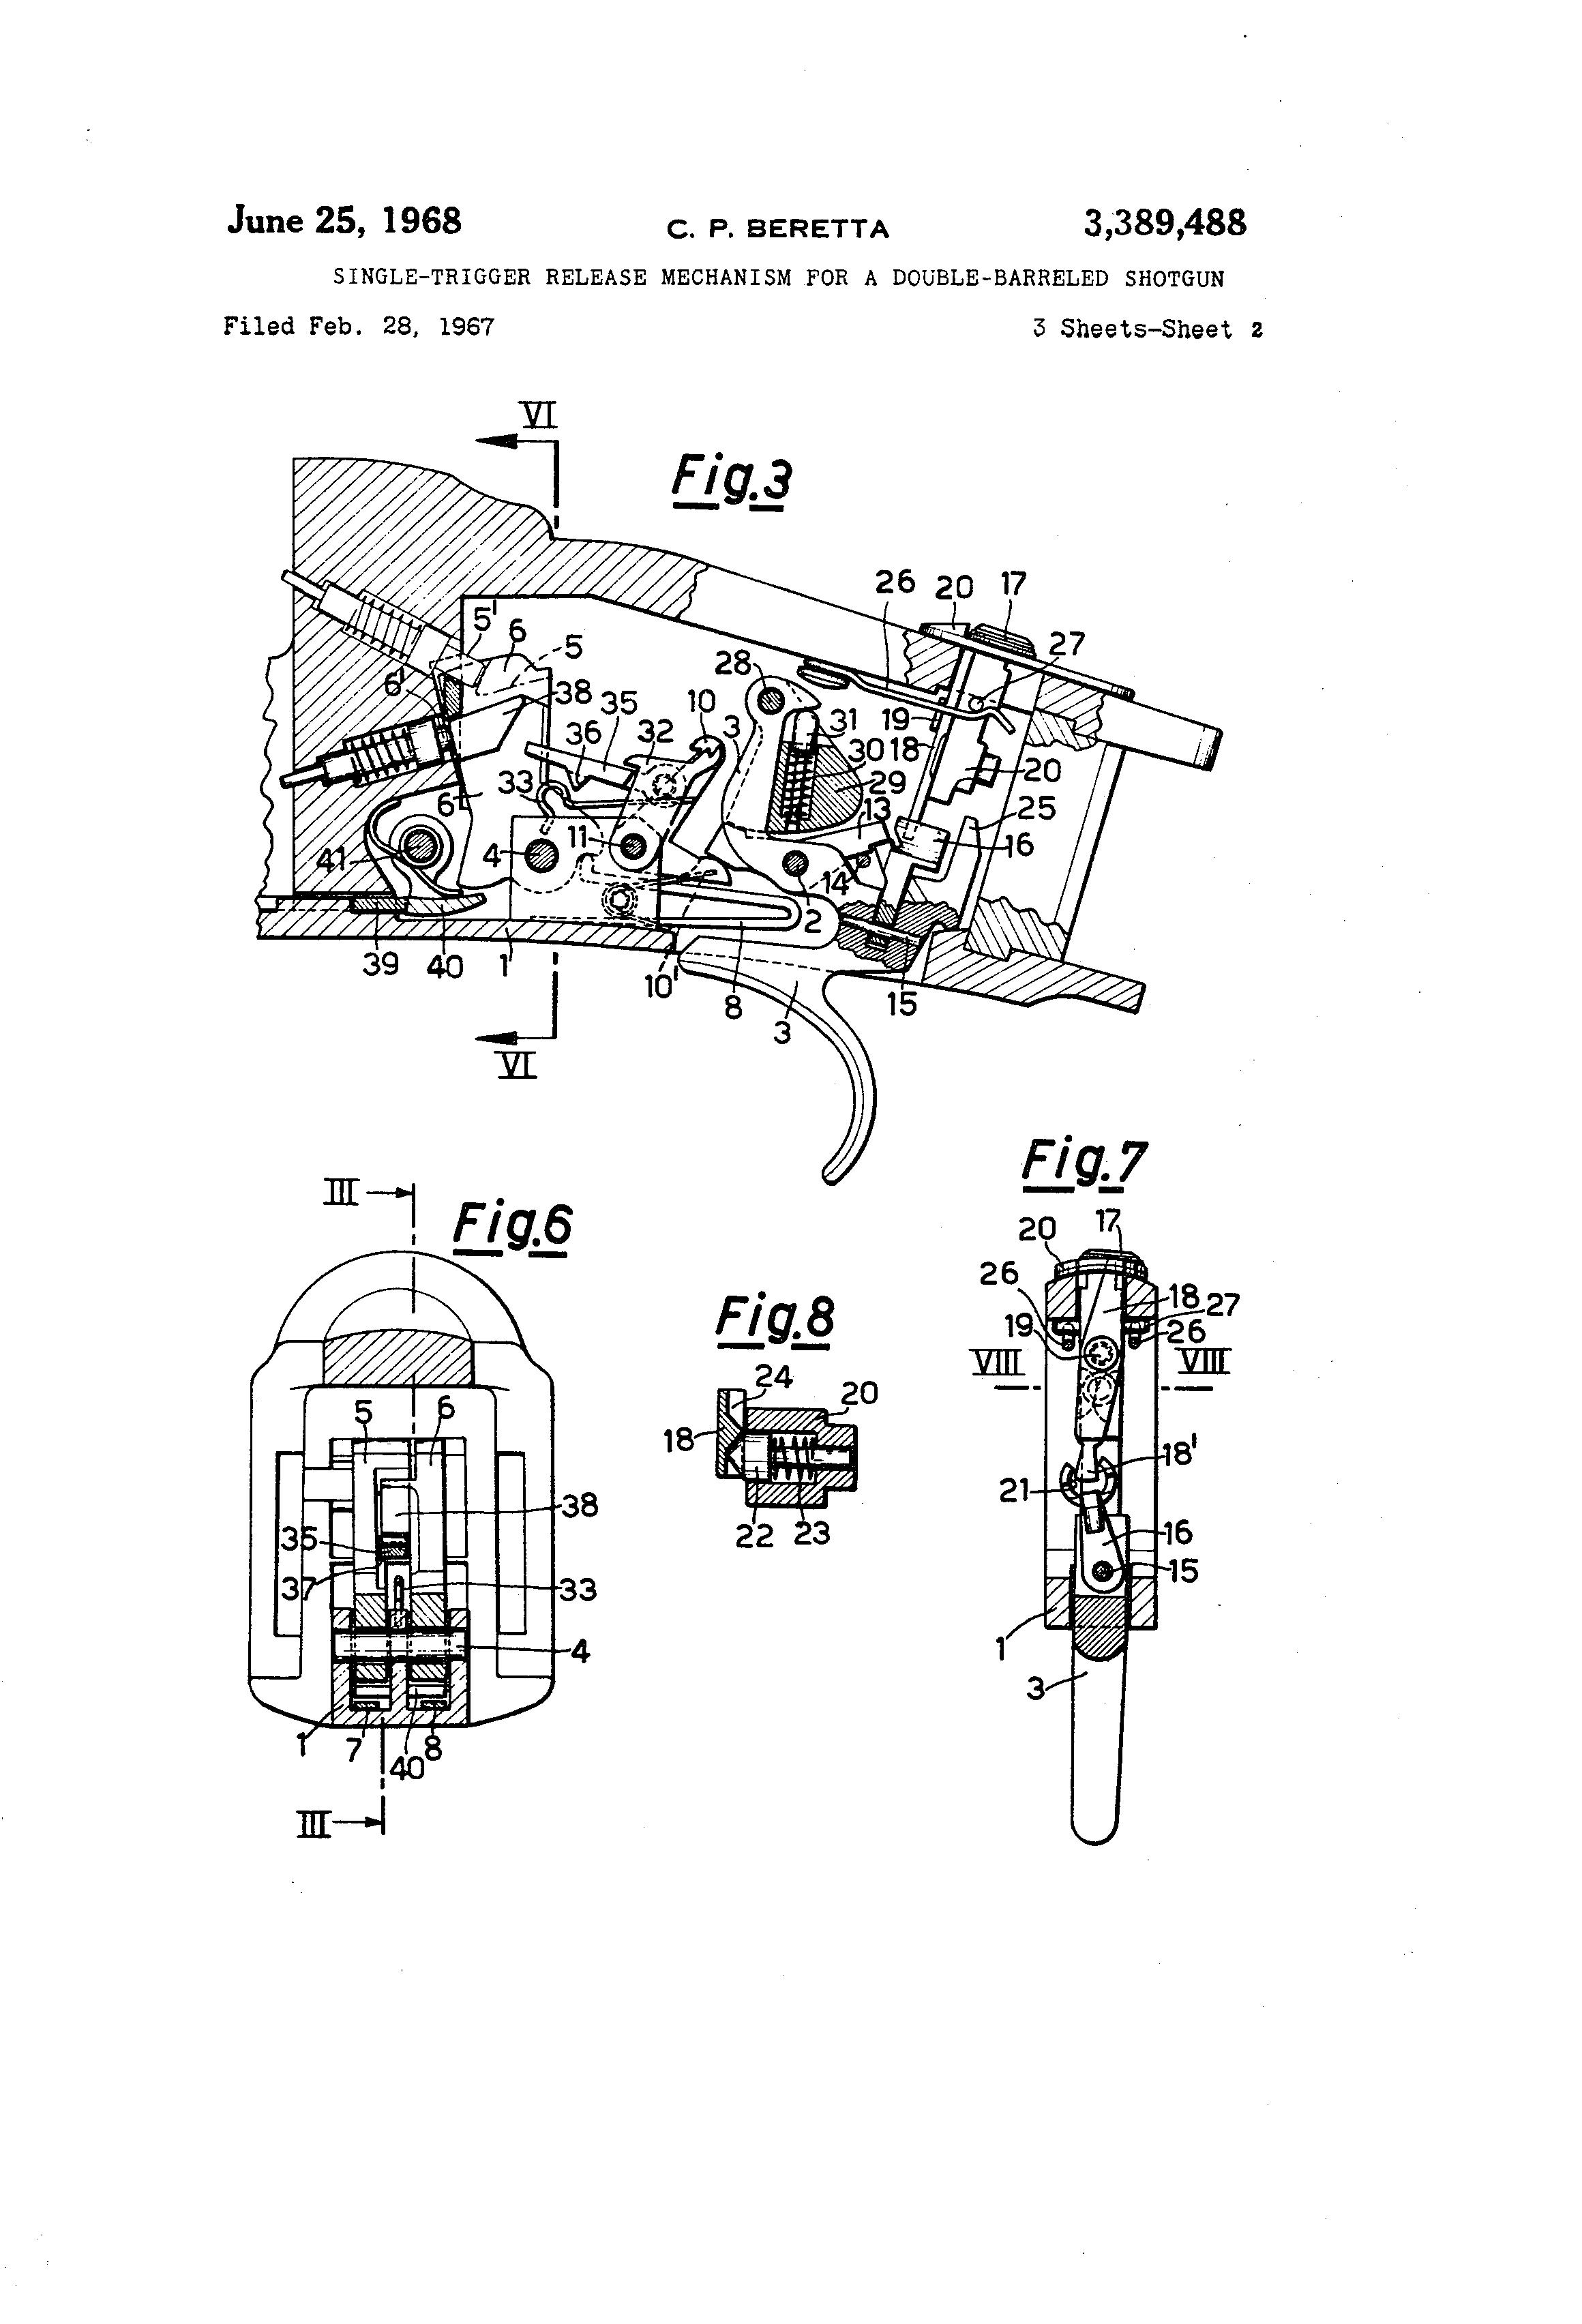 Patent Us3389488 - Single-trigger Release Mechanism For A Double-barreled Shotgun